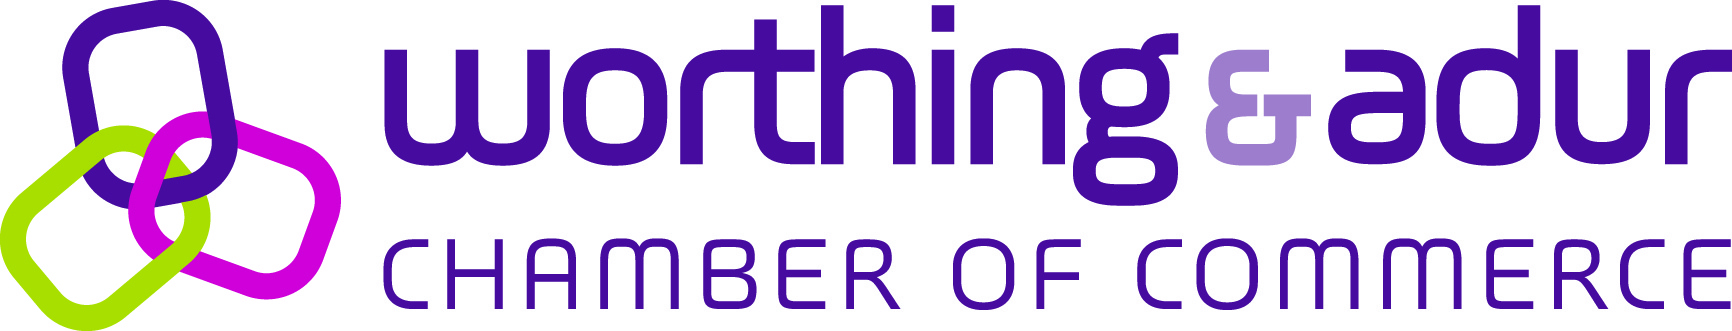 worthing__adur_chamber_logo_cmyk_002_1732